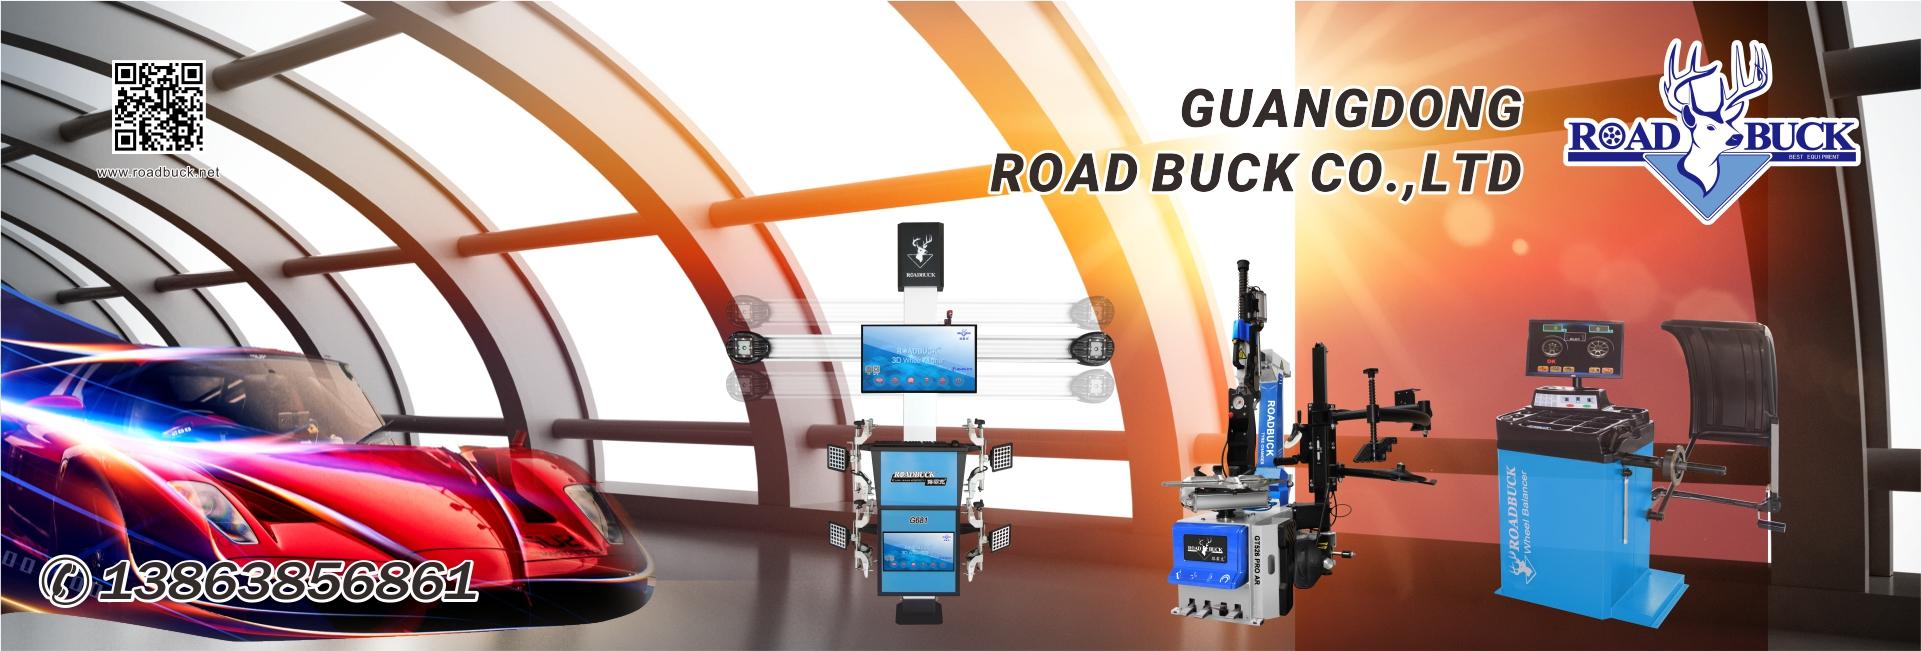 RoadBuck Exhibition